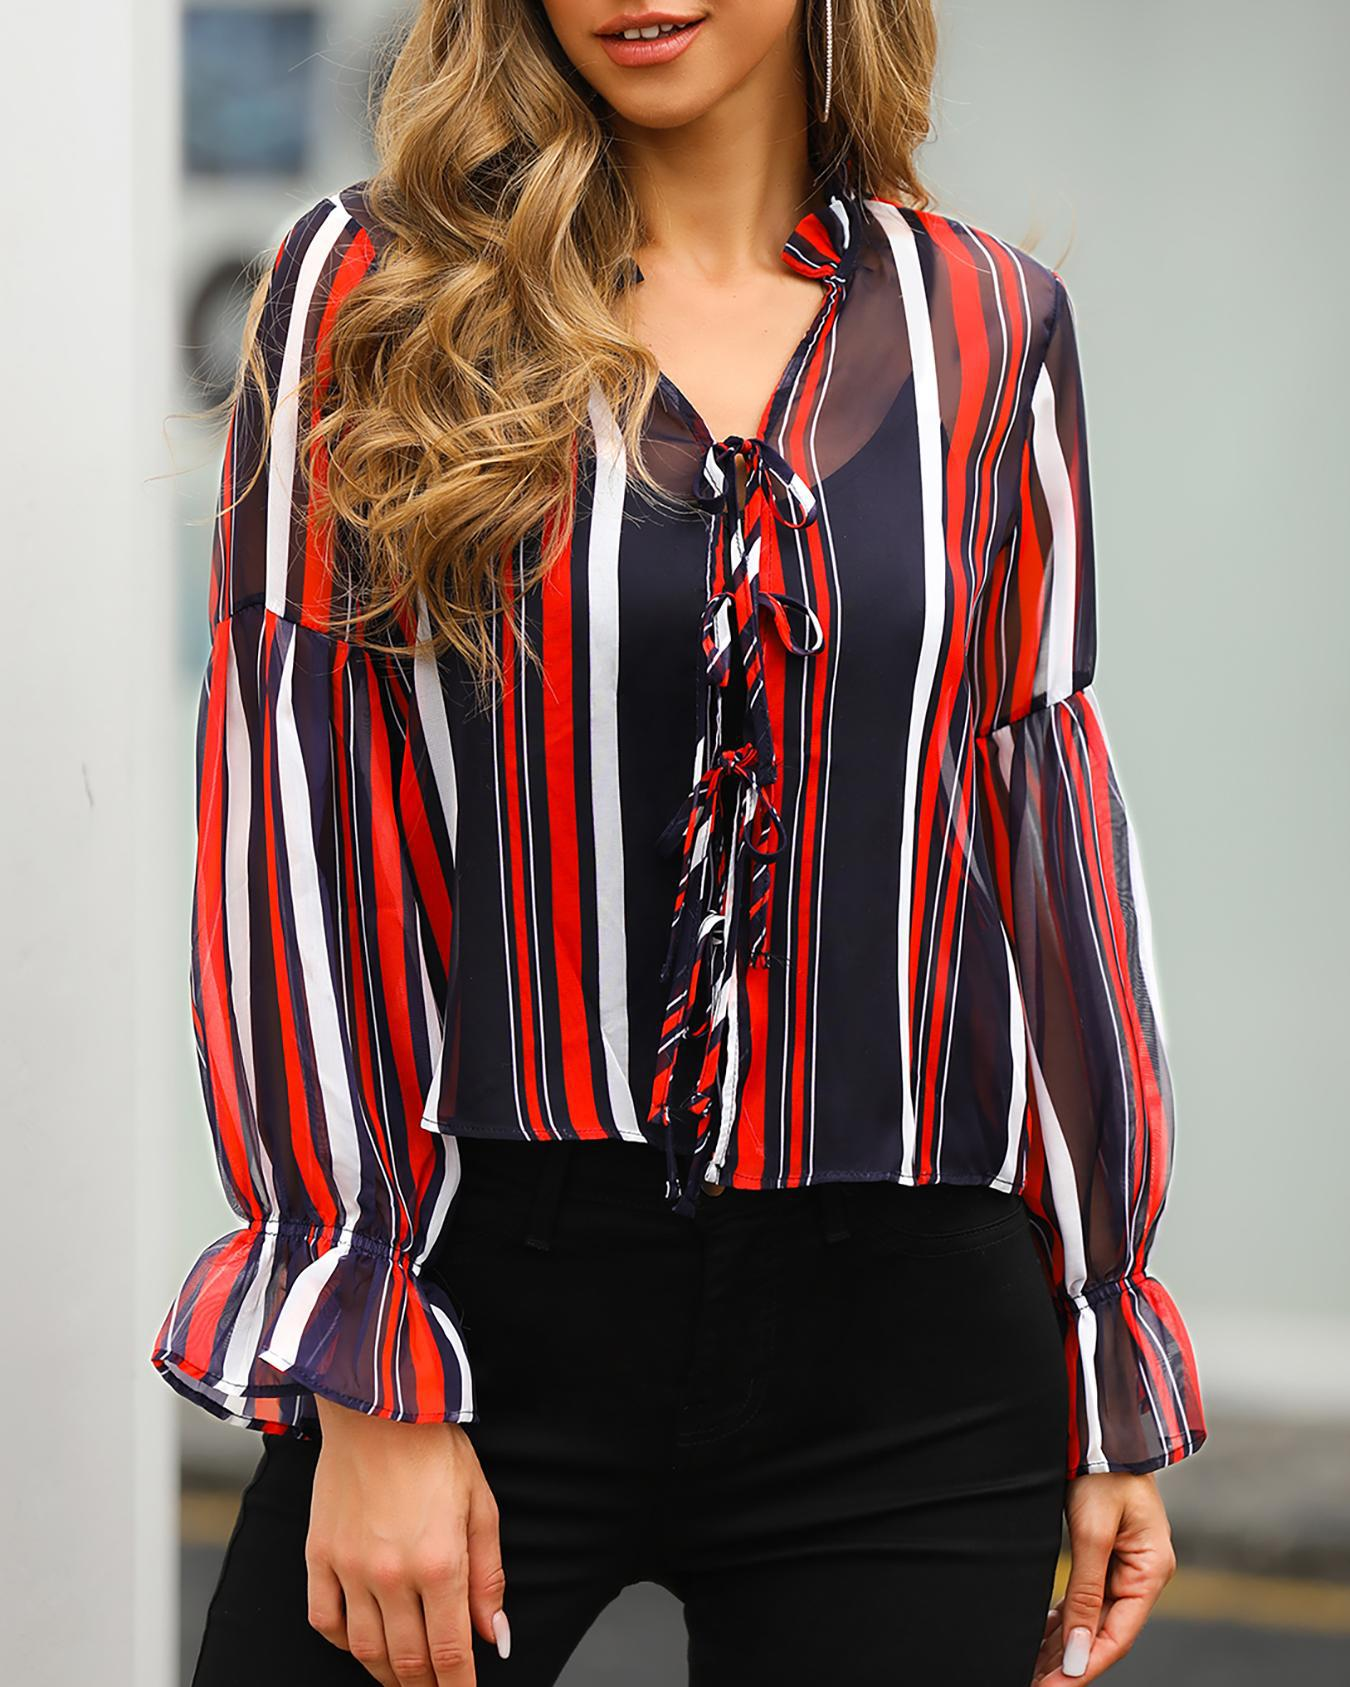 Colorful Striped Ruffles Cuff Tied Casual Shirt